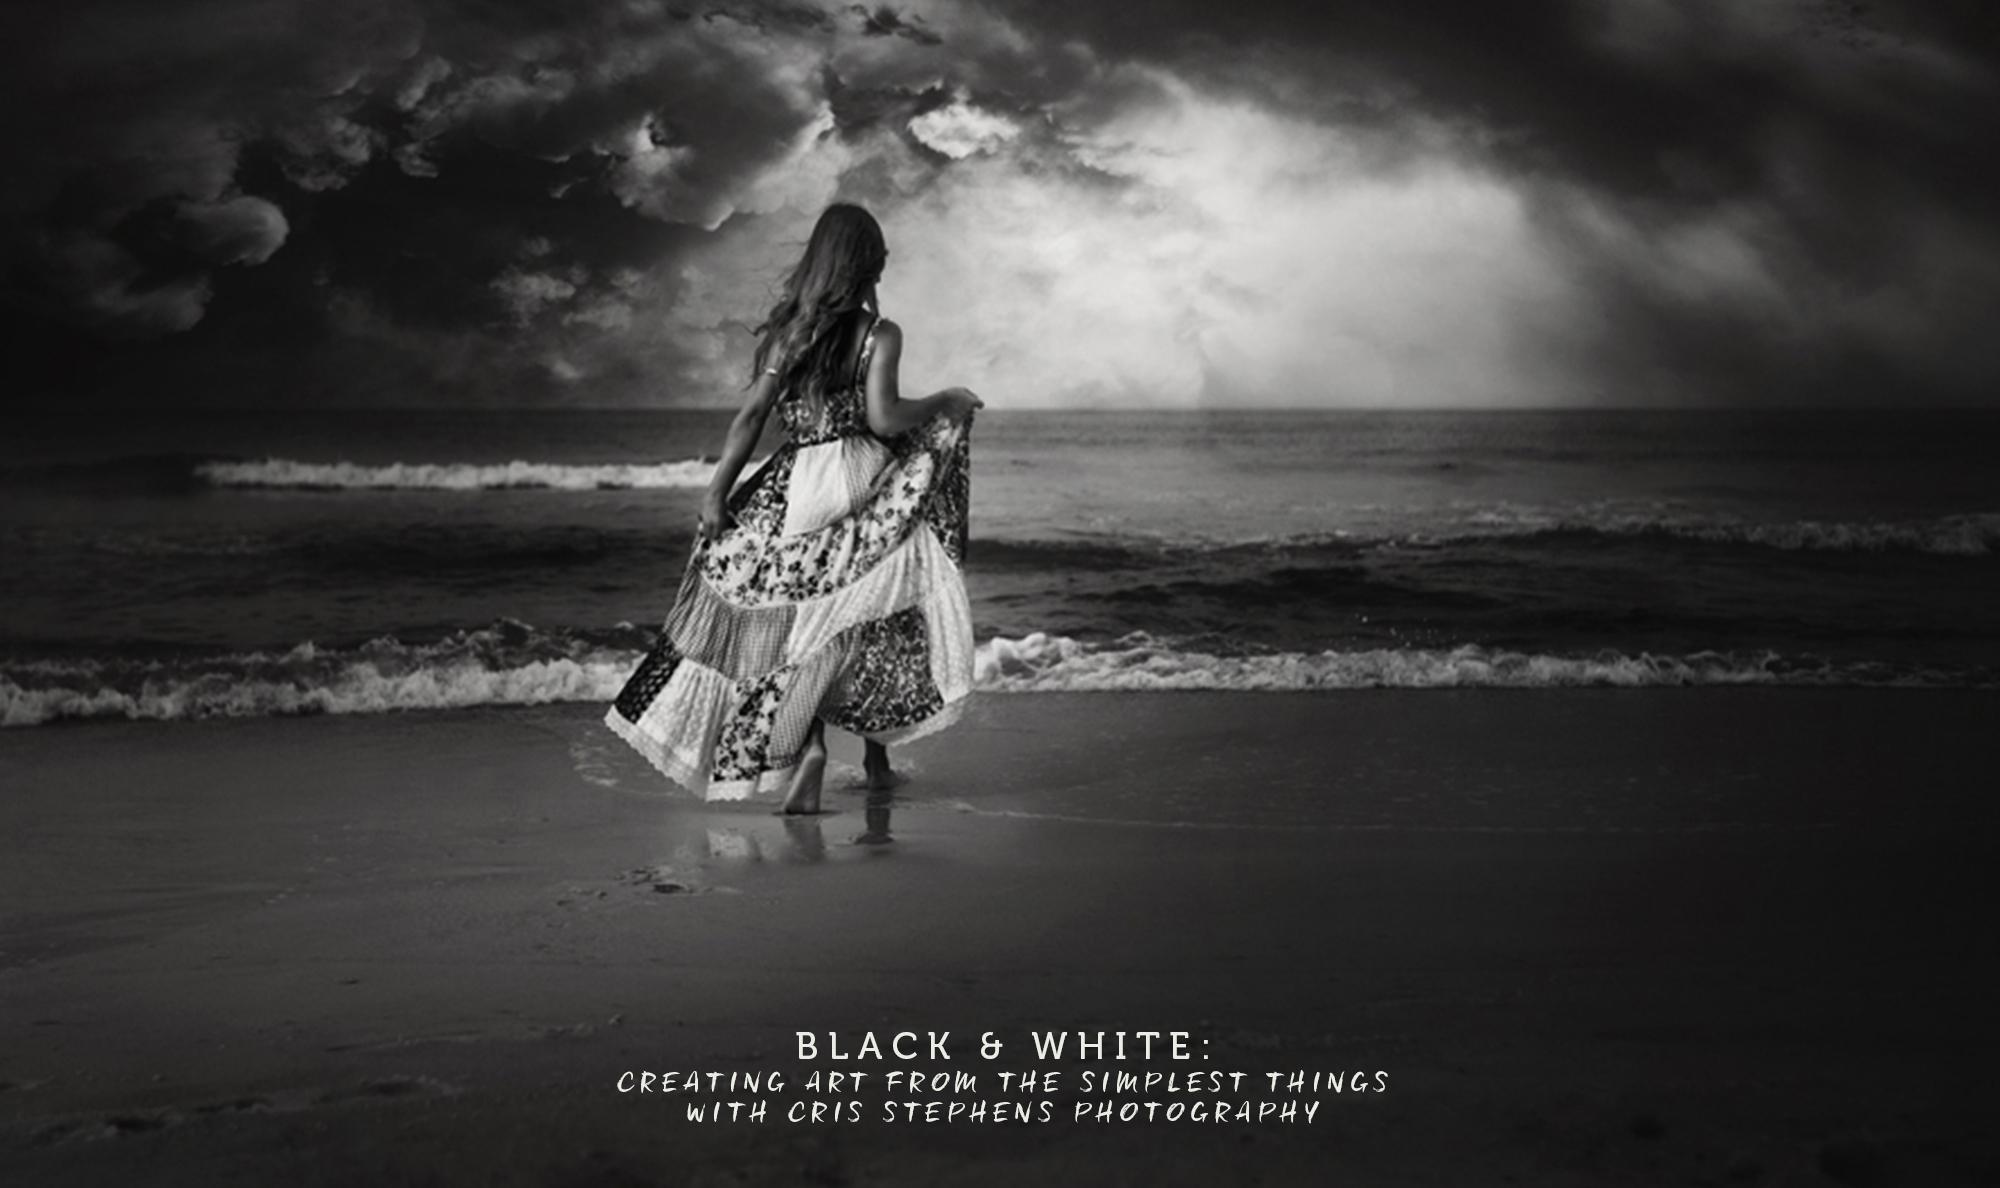 Cris Stephens black and white workshop